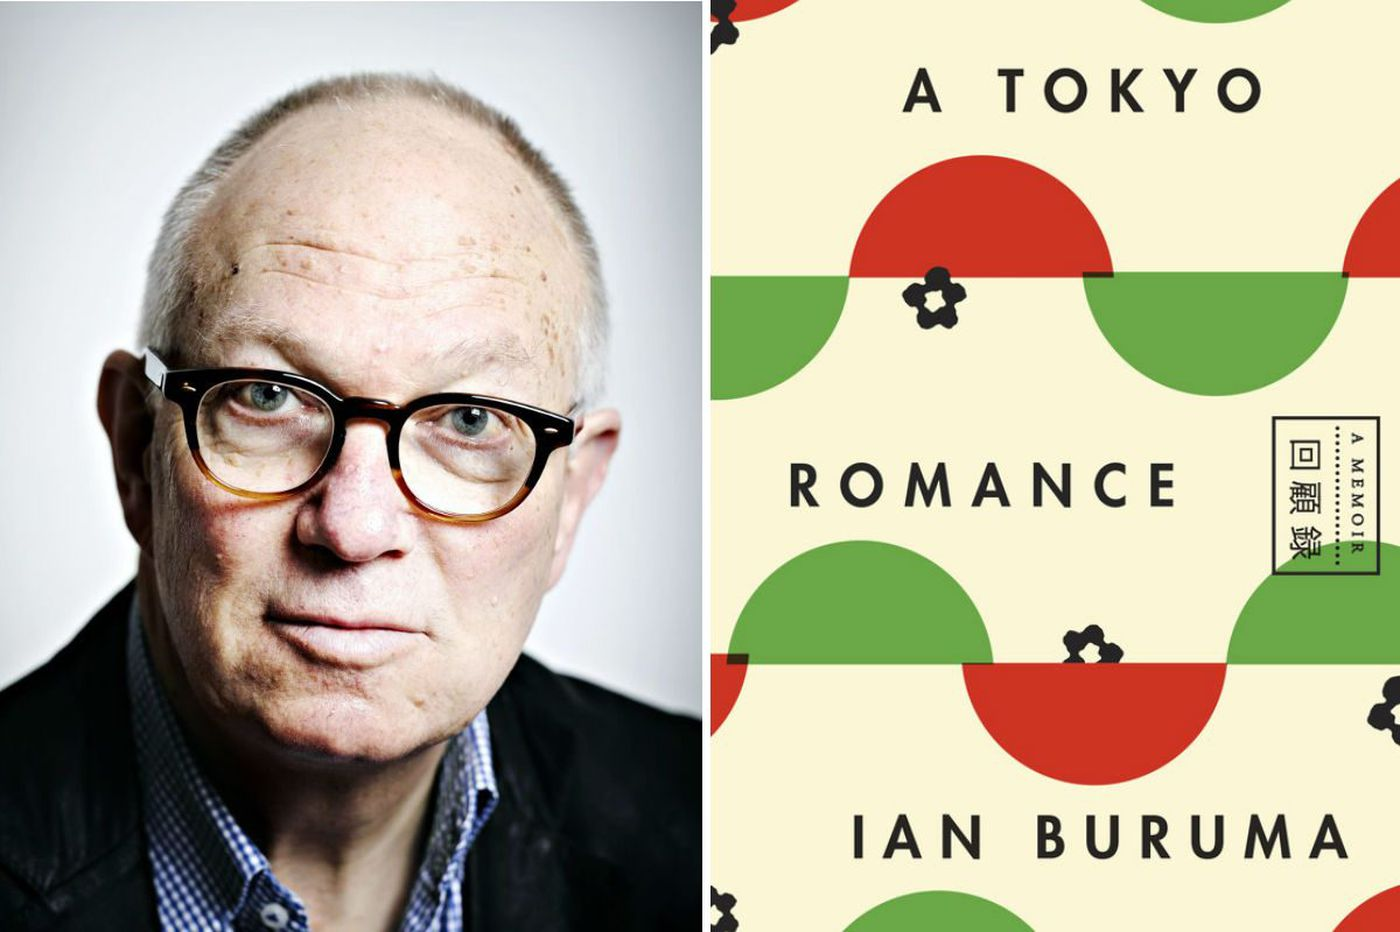 Ian Buruma brings 'A Tokyo Romance' to the Free Library Thursday